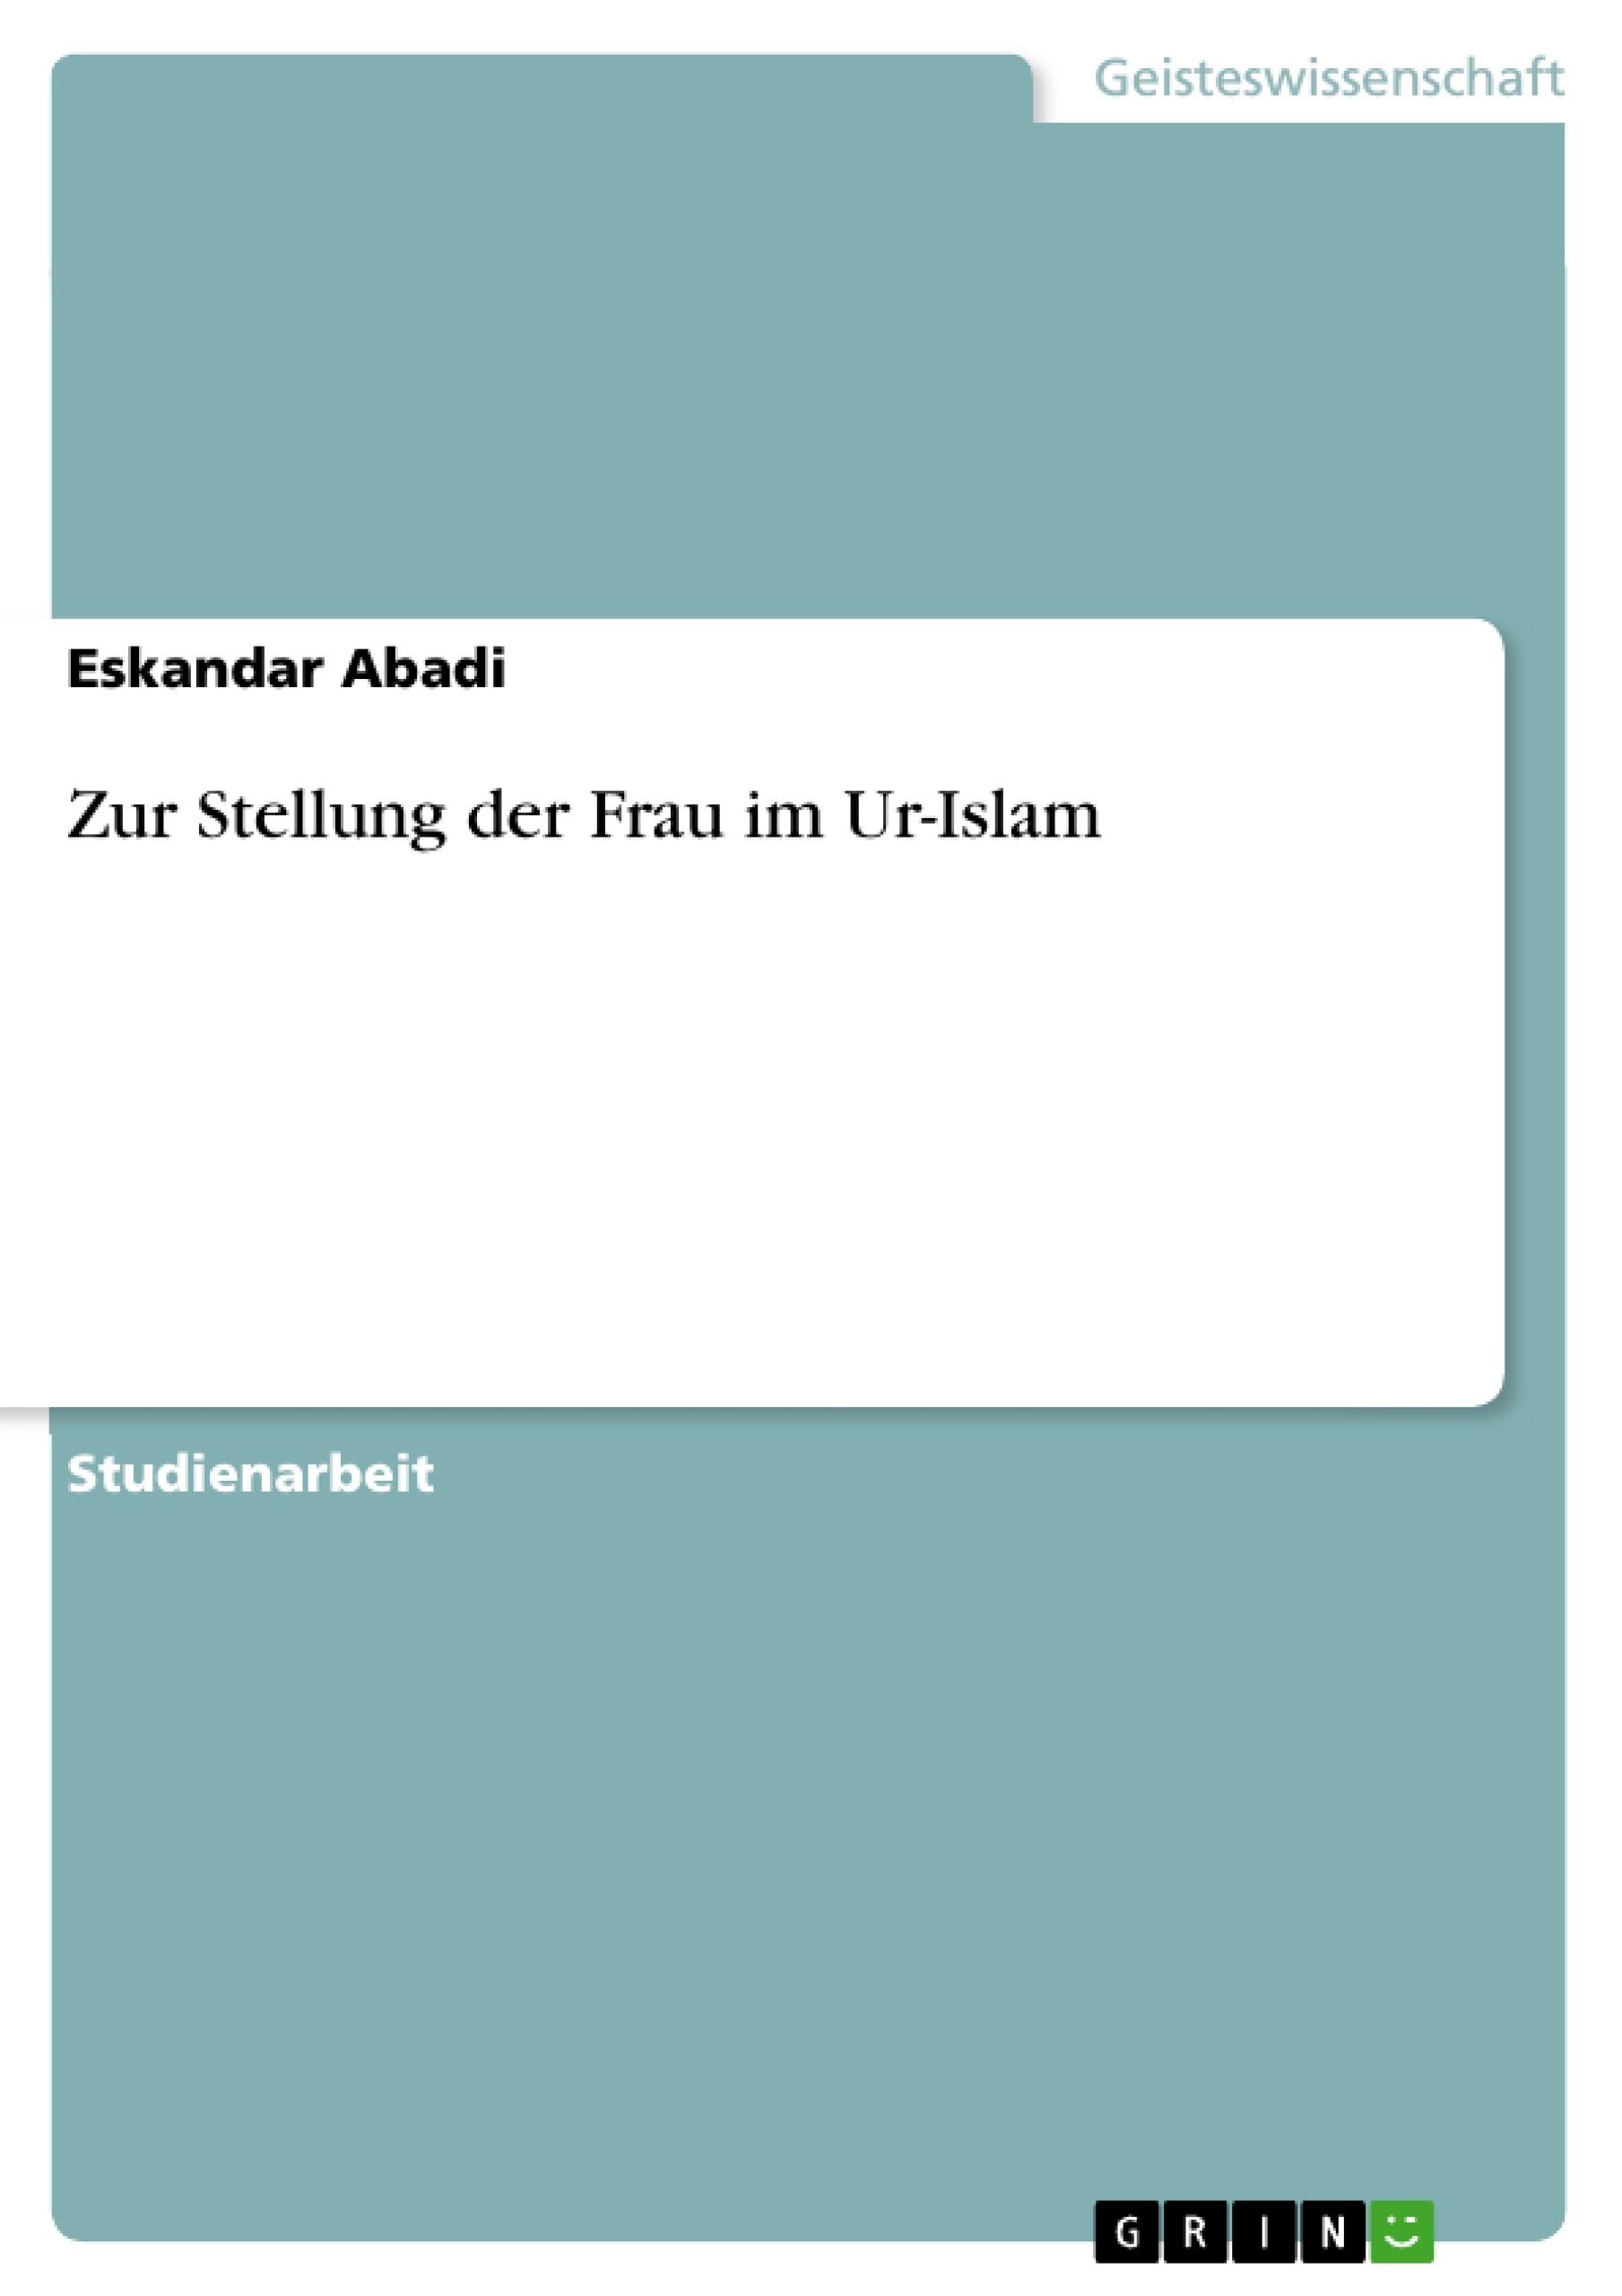 Titel: Zur Stellung der Frau im Ur-Islam